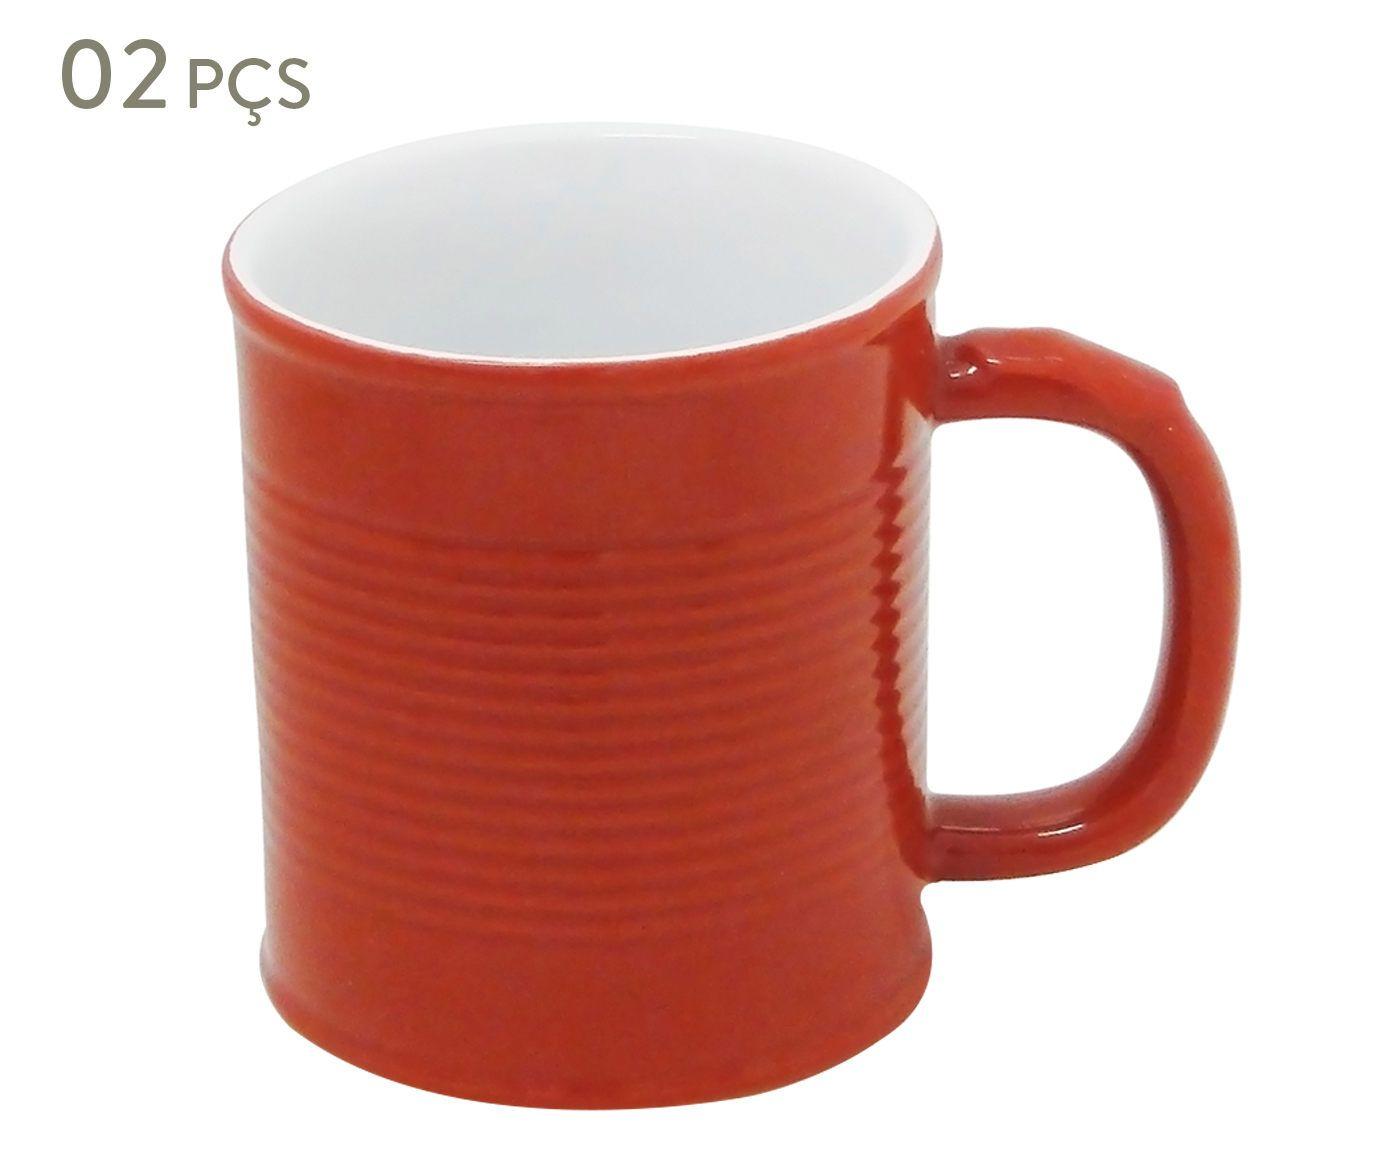 Conjunto de Canecas Espalier rouge - 350 ml   Westwing.com.br